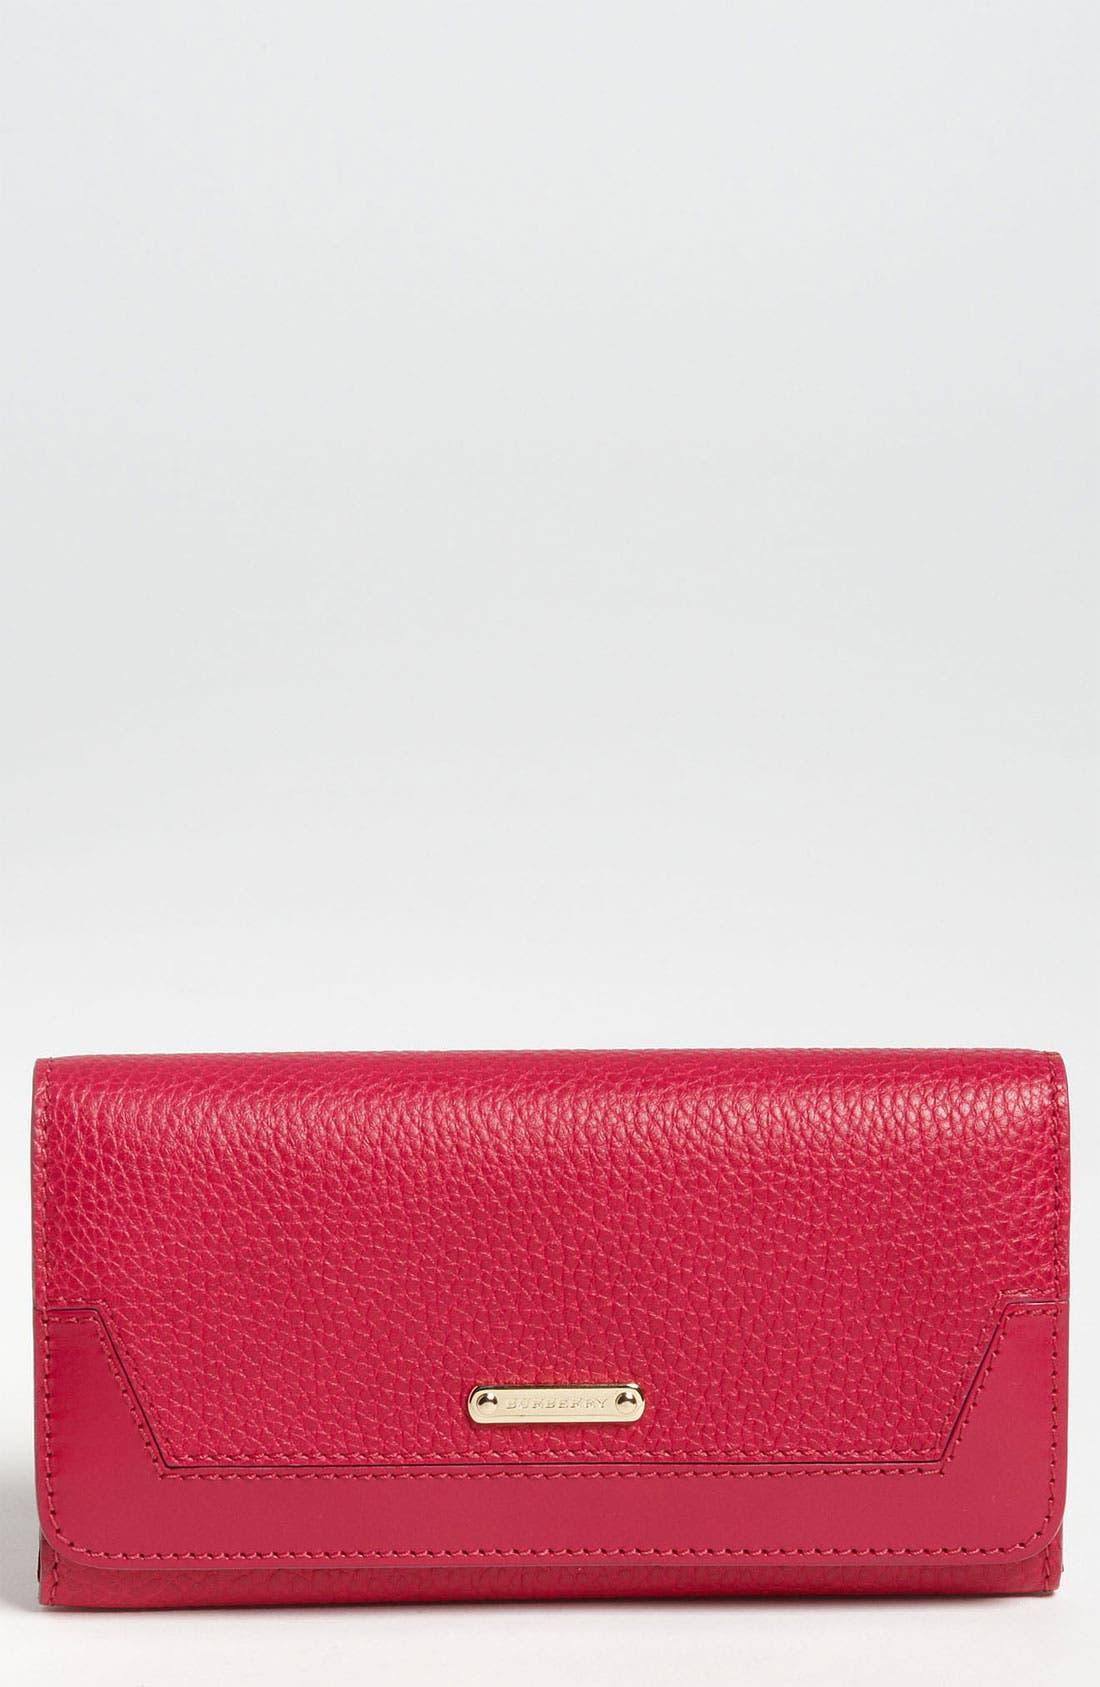 Main Image - Burberry 'London Grainy' Flap Wallet